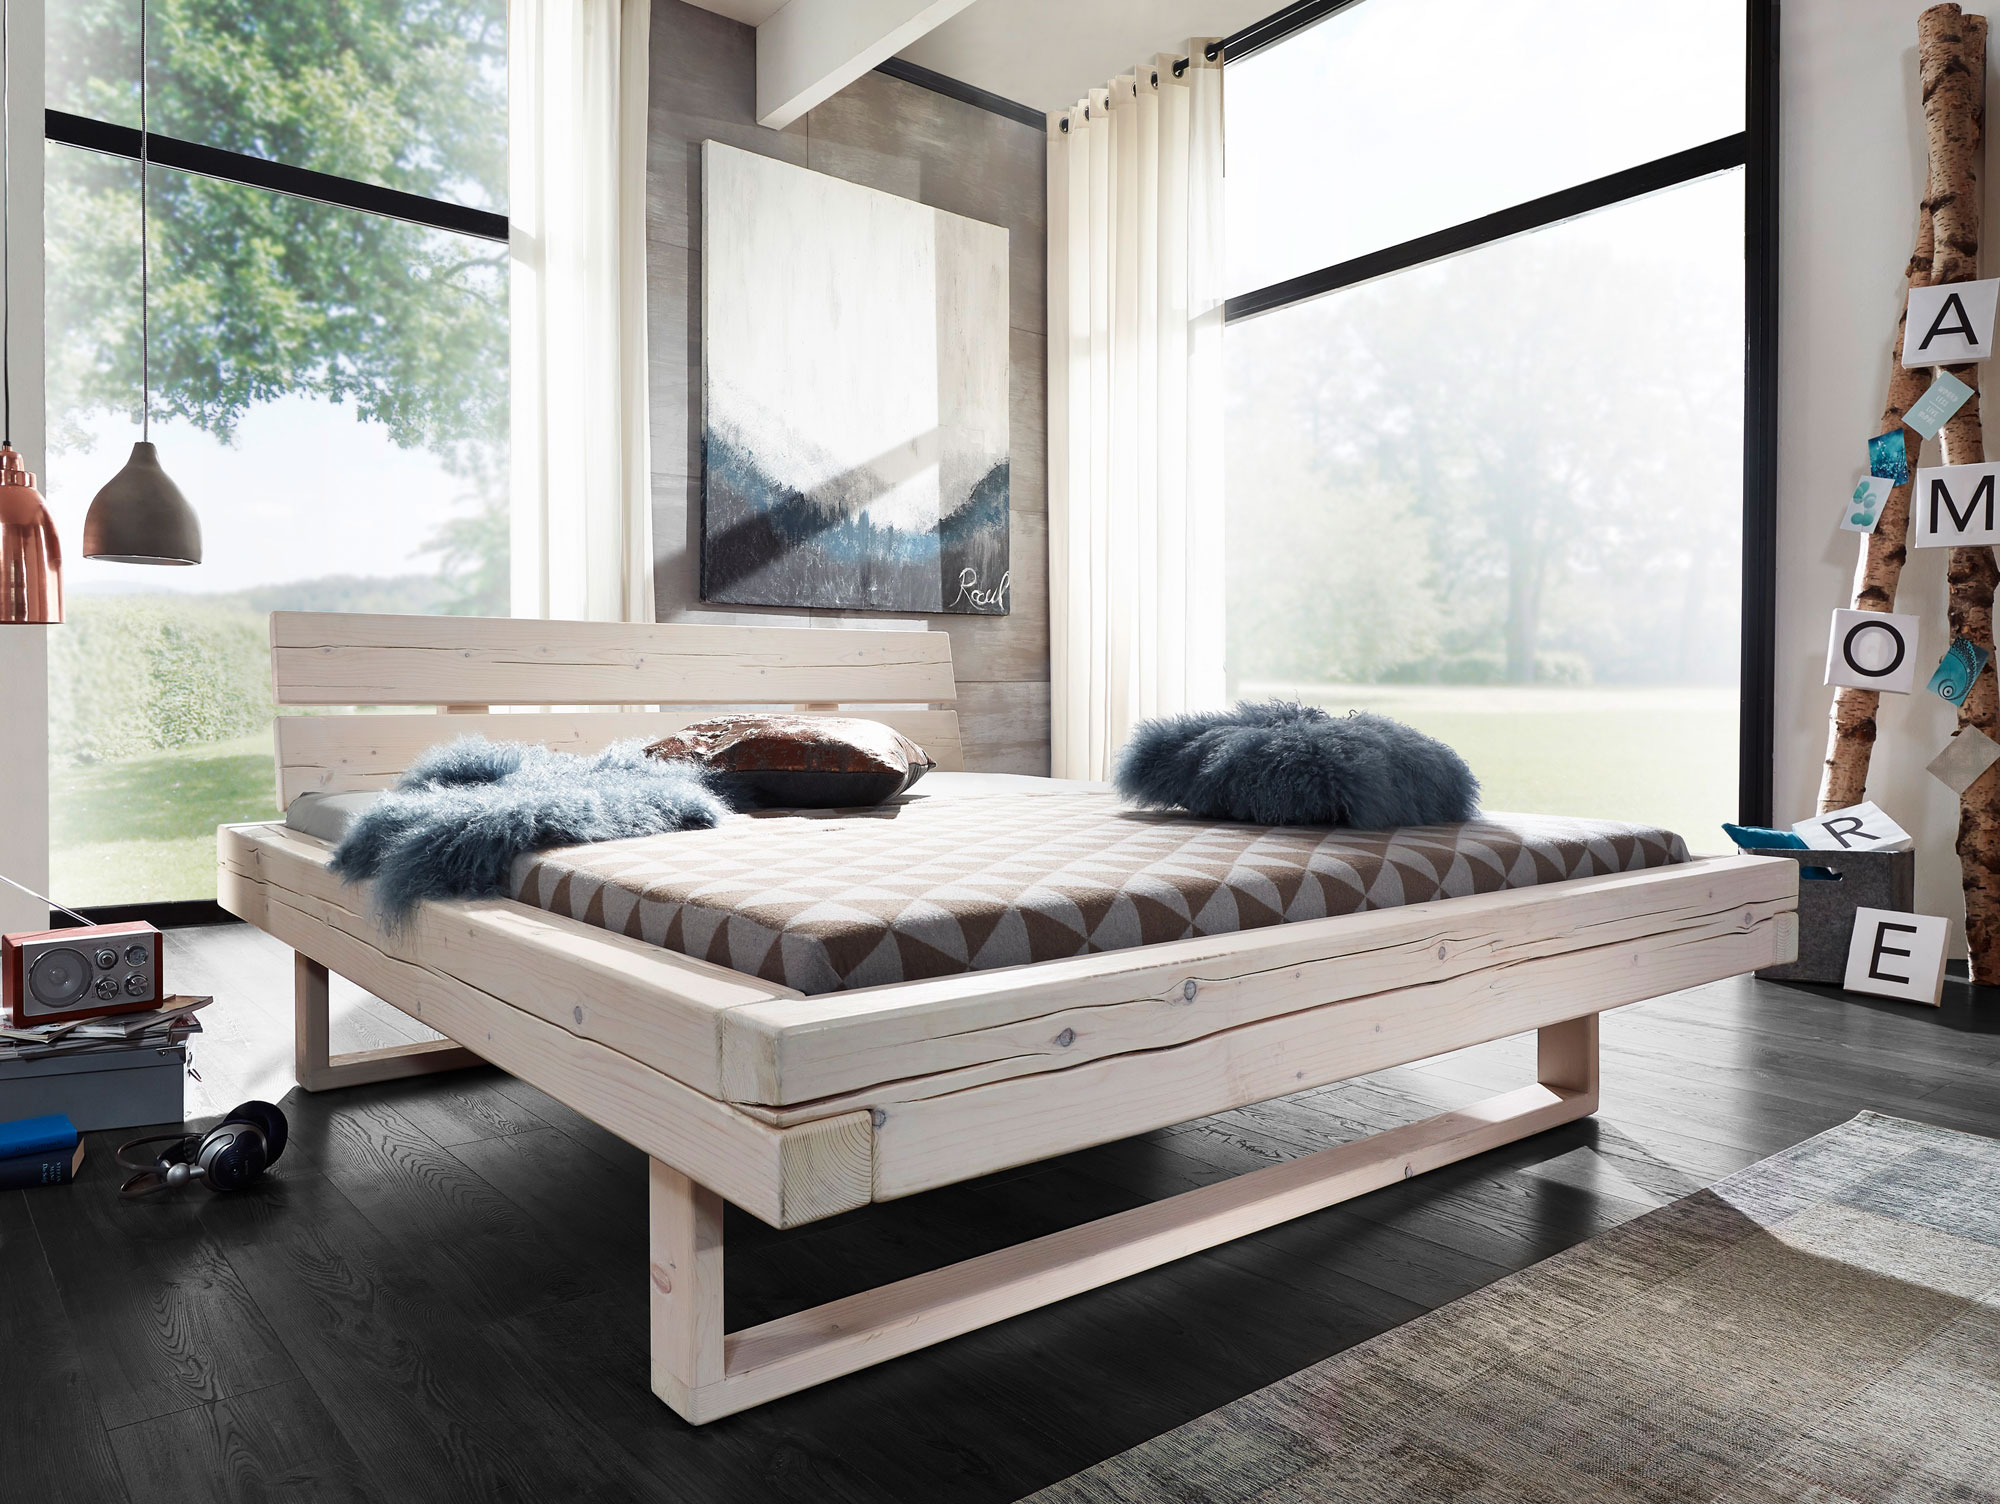 rocky massivholzbett fichte weiss lasiert 160 x 200 cm. Black Bedroom Furniture Sets. Home Design Ideas